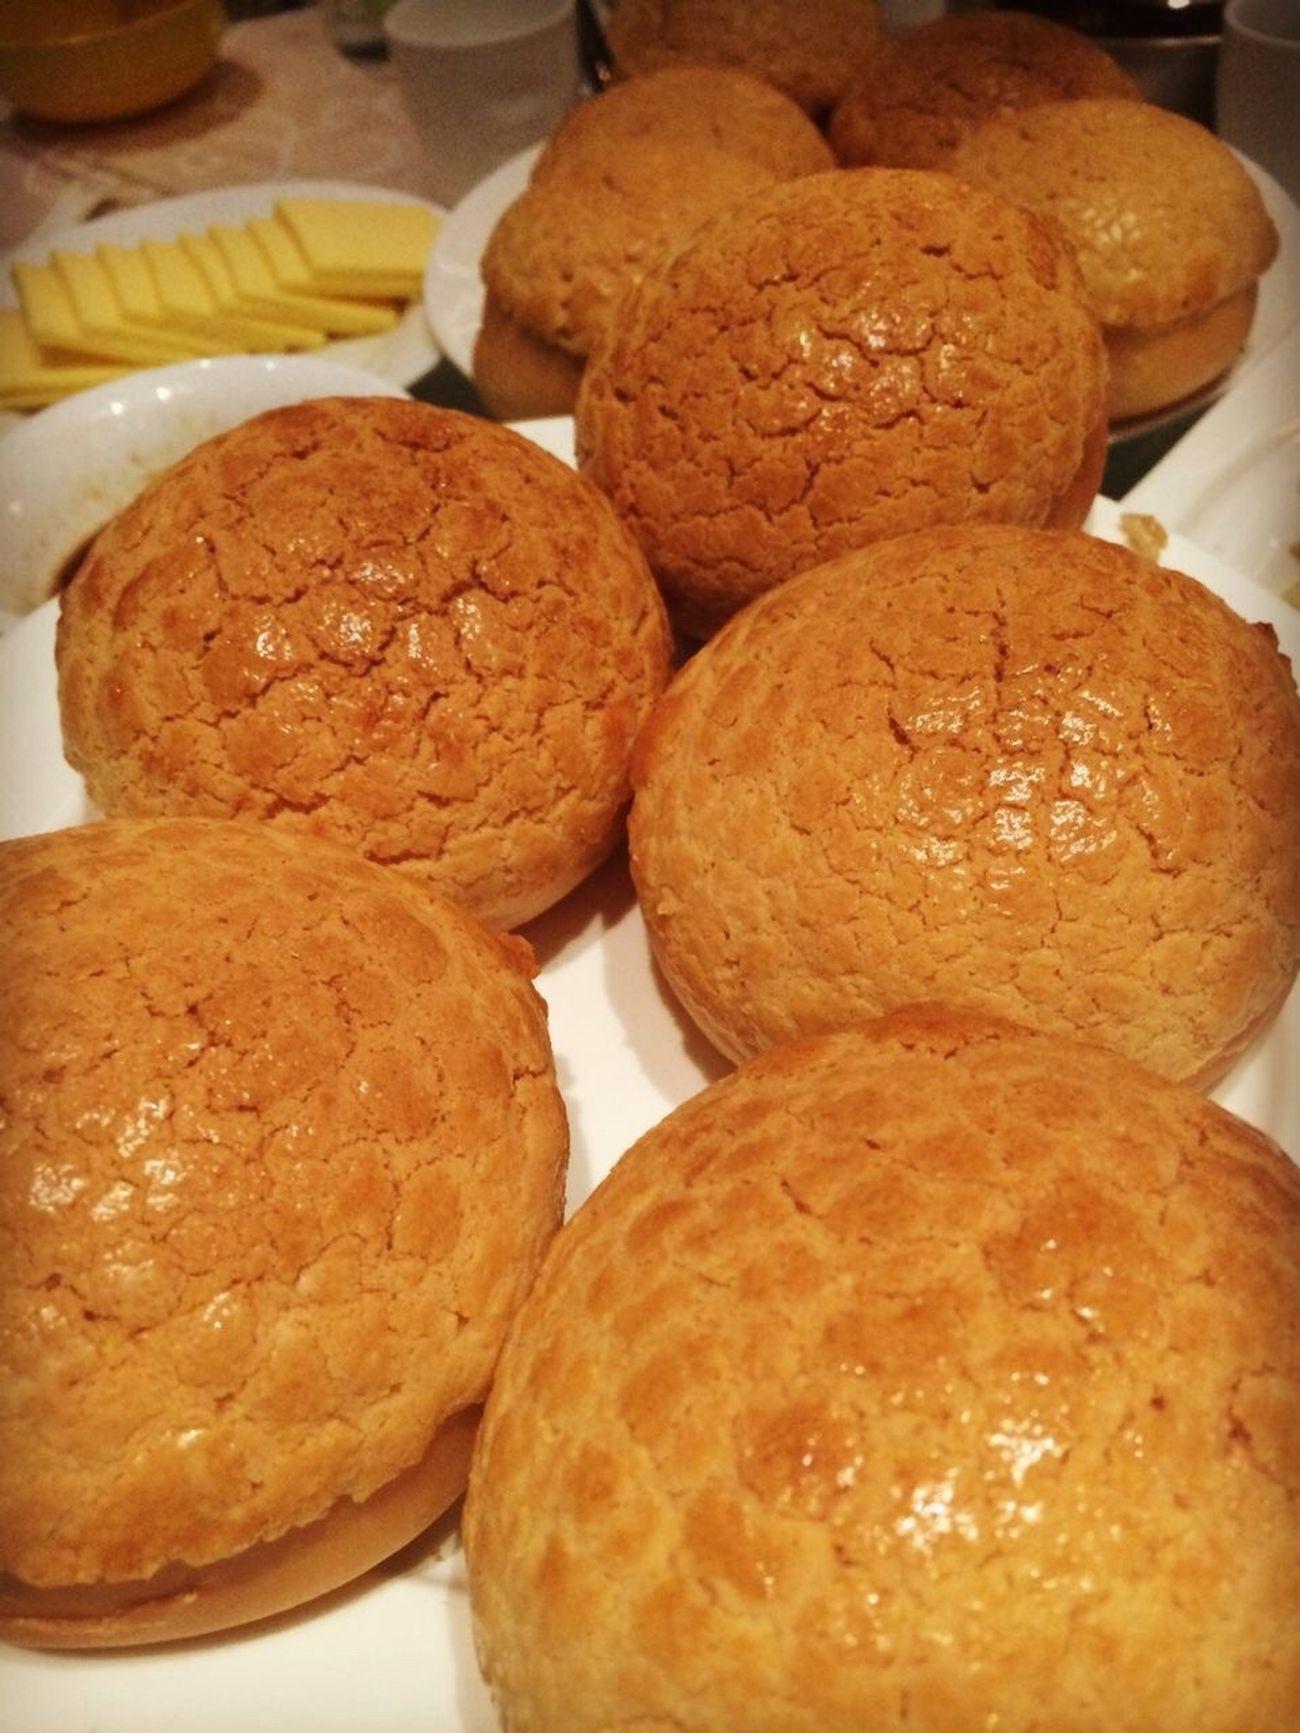 Delicious ♡ Today's Hot Look 菠萝包 Pineapple Bun Delicious Dessert Desserts Dessert Porn Snack Sweets